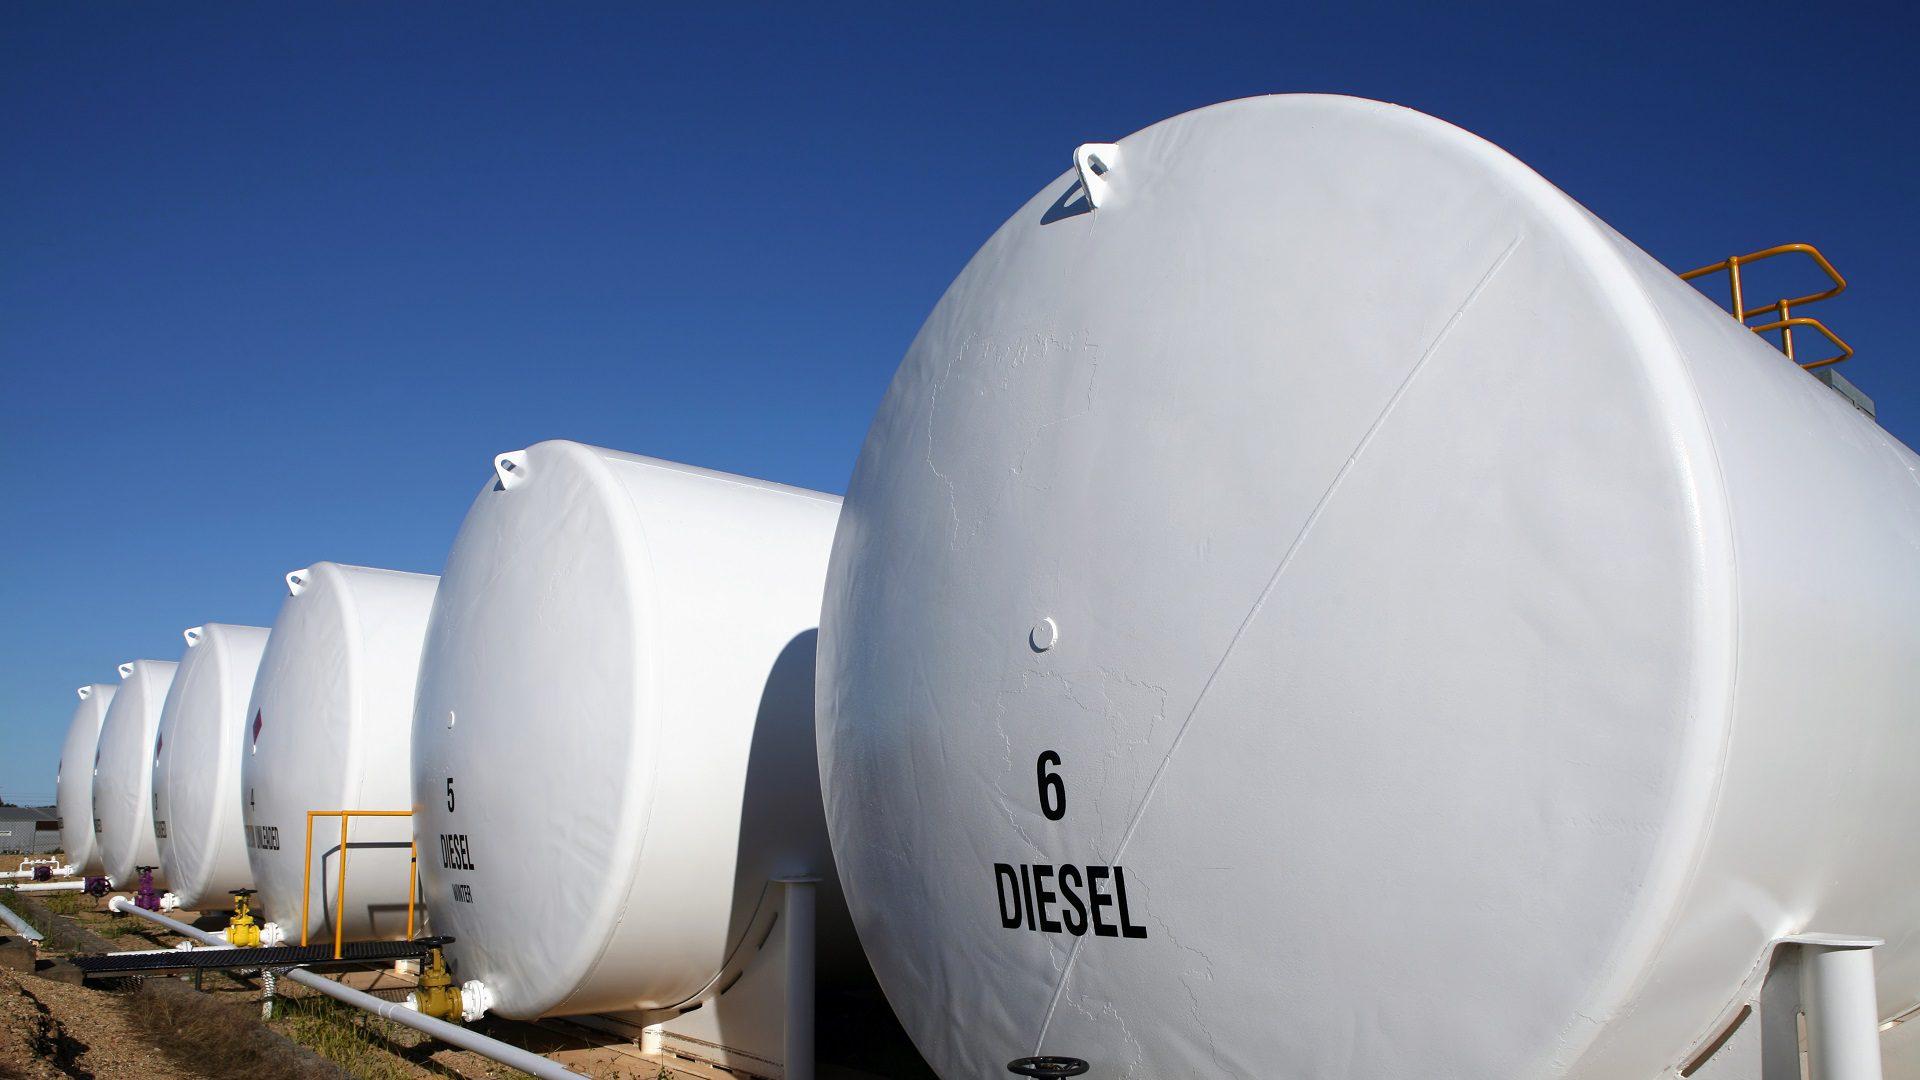 Arnold Oil Fuels – Arnold Oil